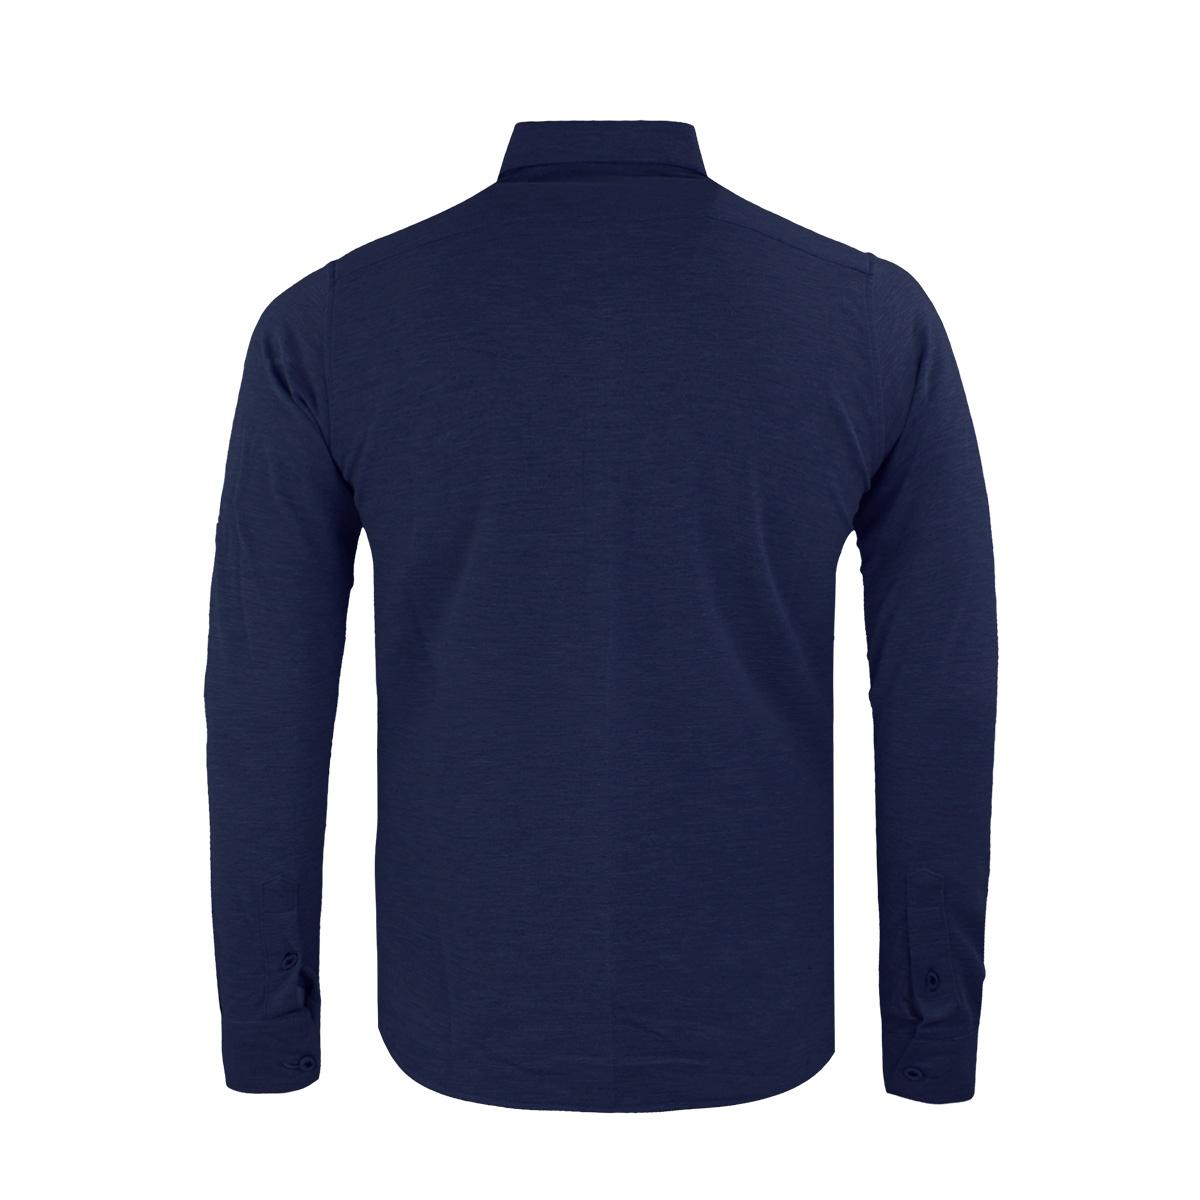 33840 gabbiano overhemd navy